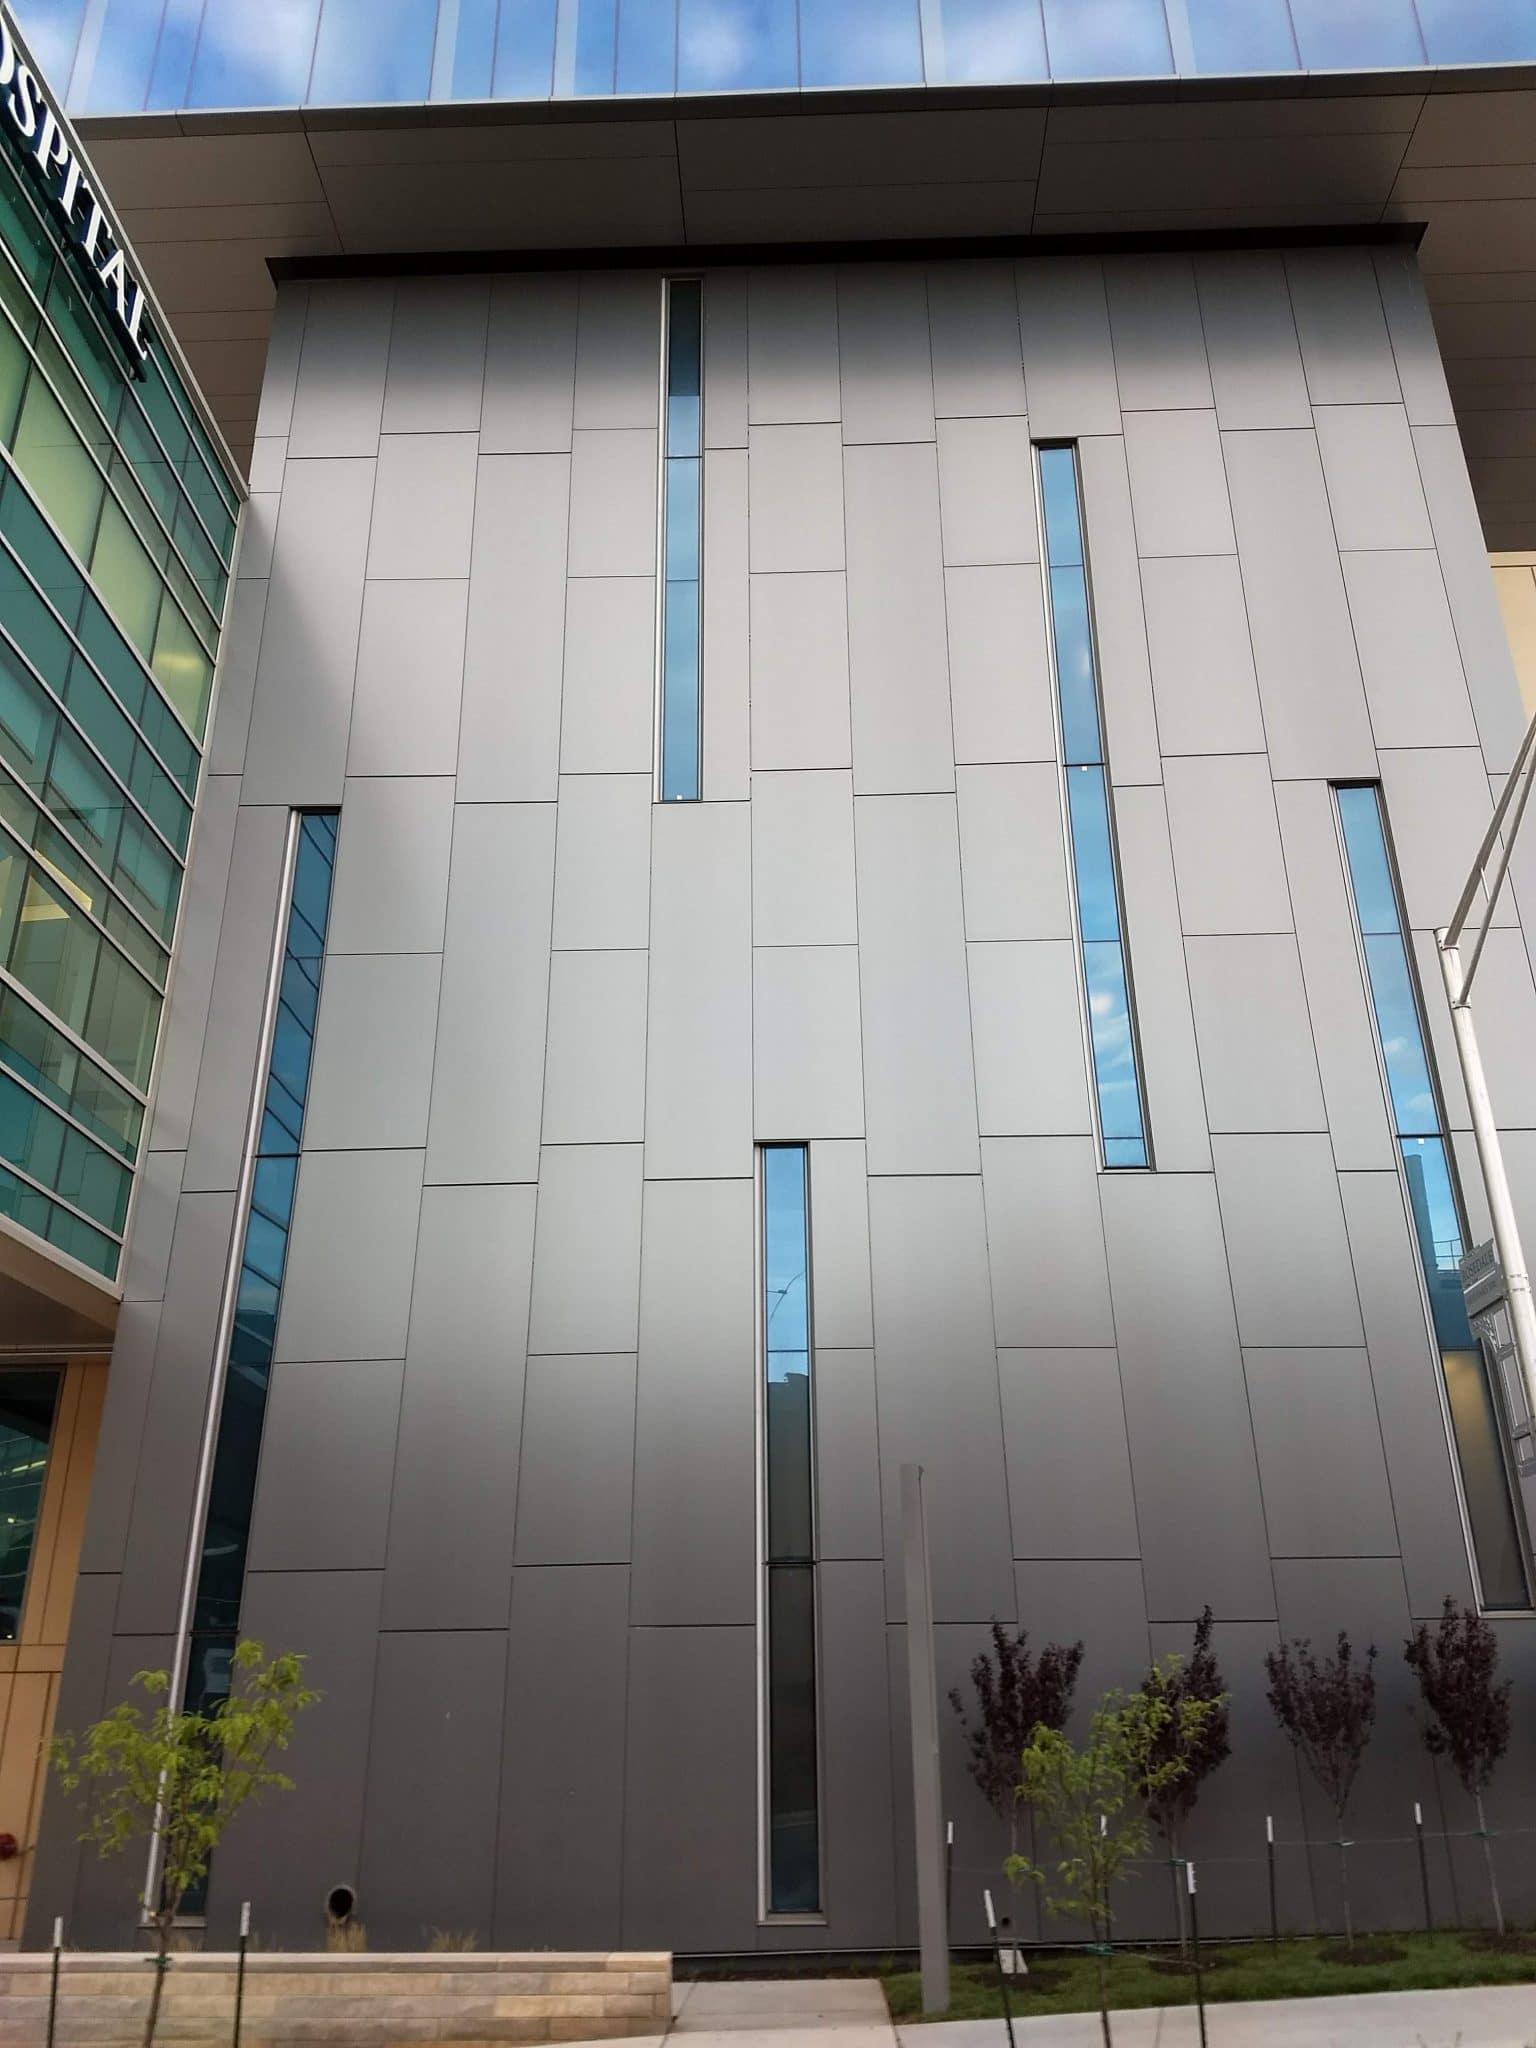 Rainscreen Cladding Technology and Solutions   QC Façades